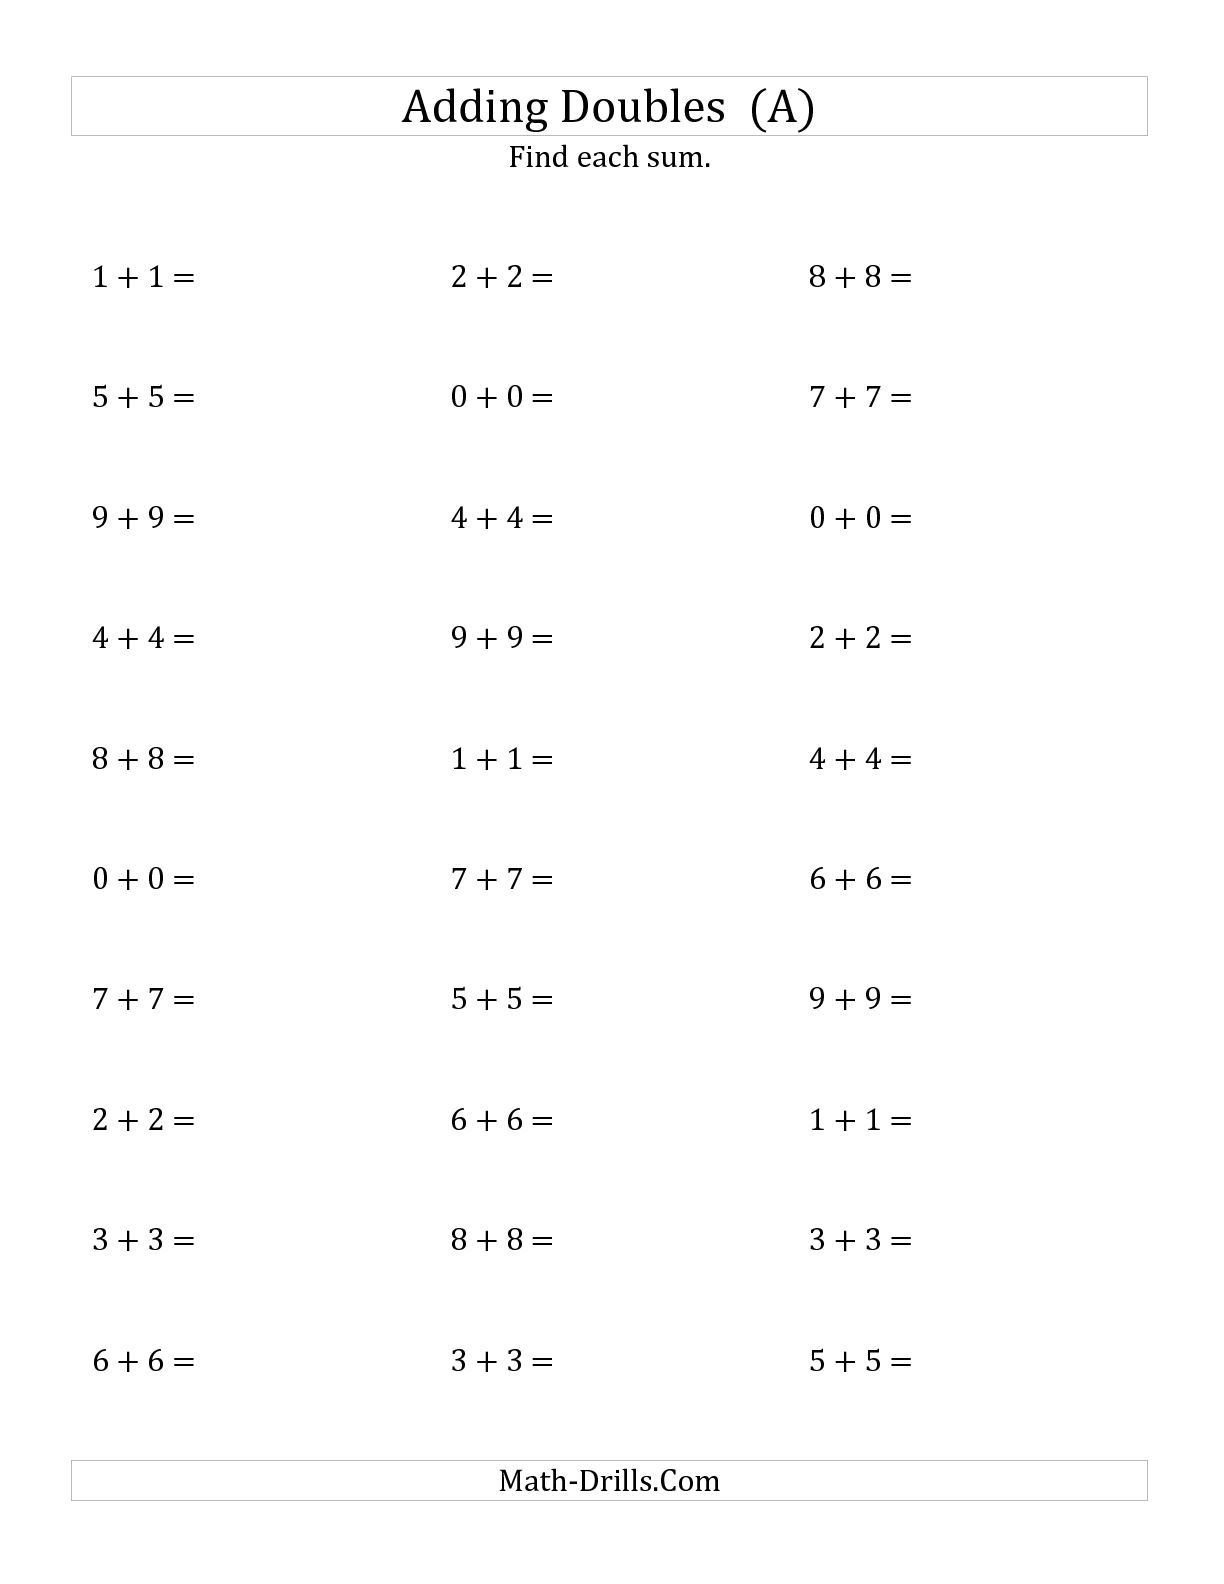 Adding Integers Worksheet Pdf